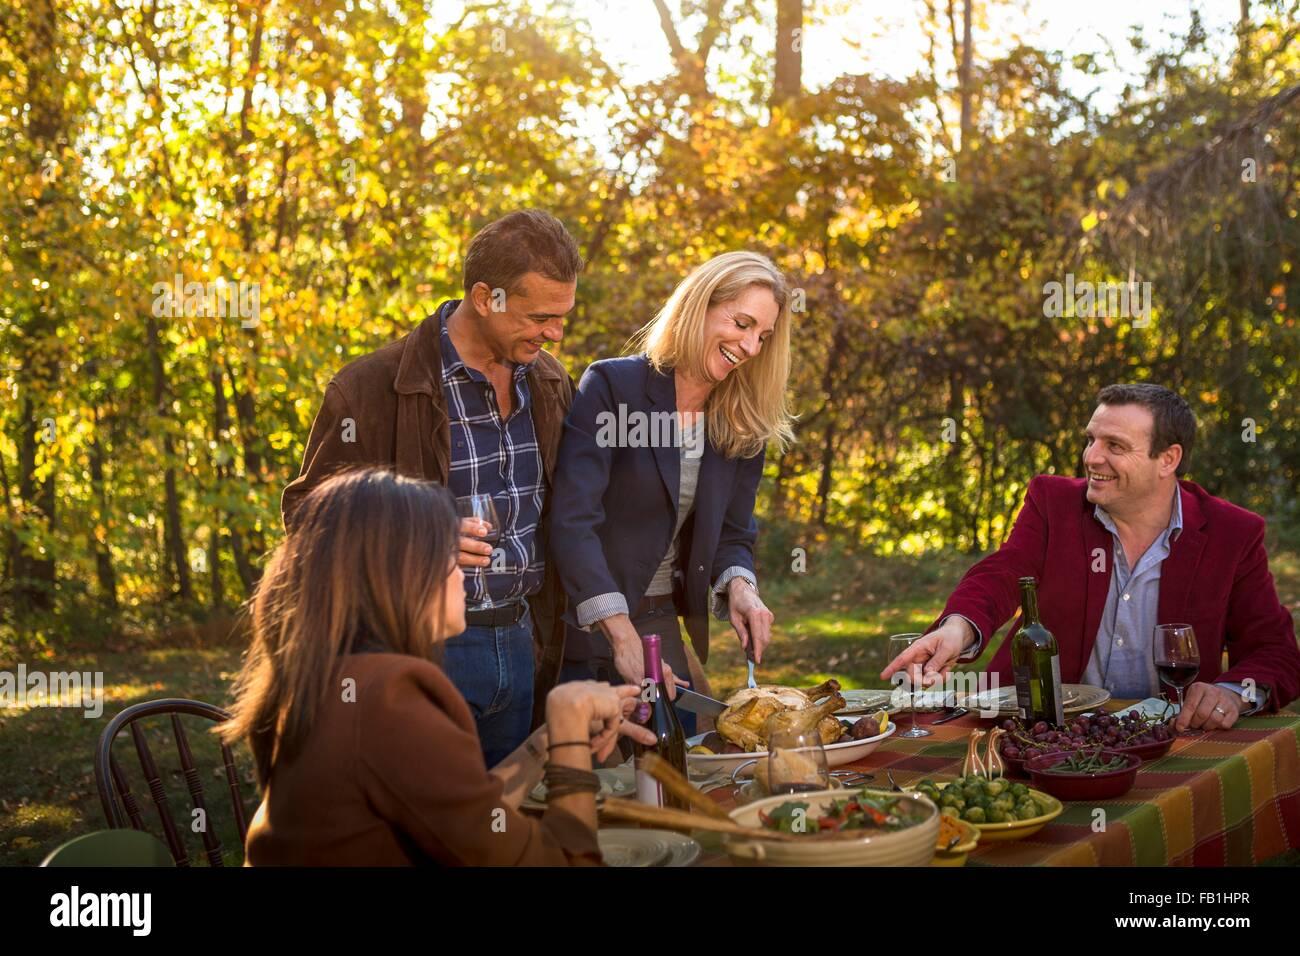 Zwei ältere Ehepaare, Braten Abendessen am Gartenfest Stockbild